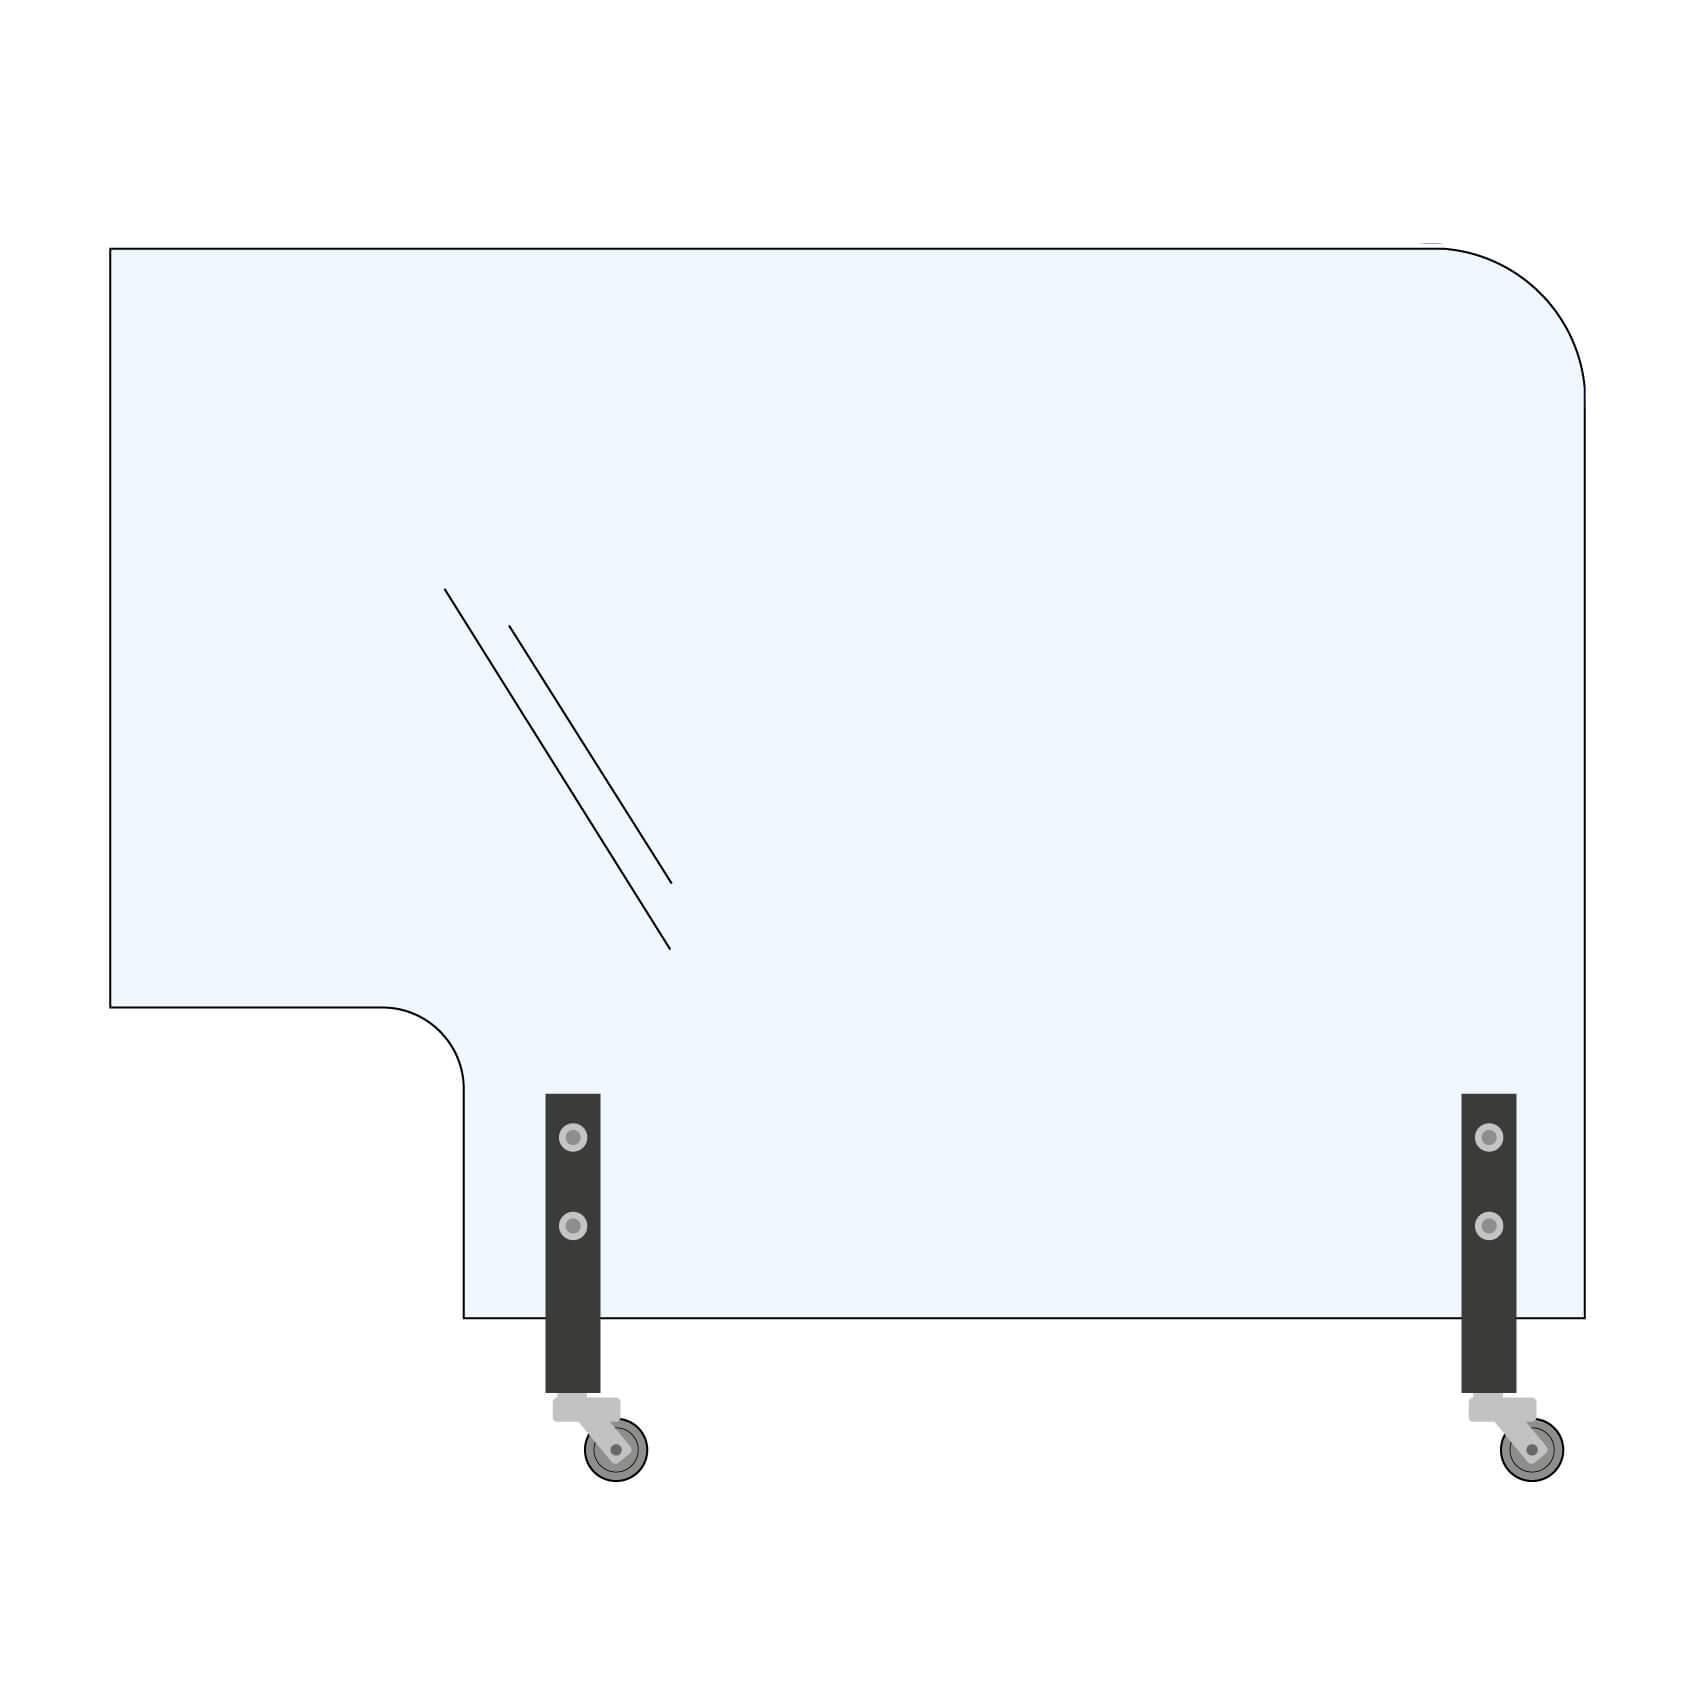 Trennwand Rundecke+Ausschnitt 200x145cm